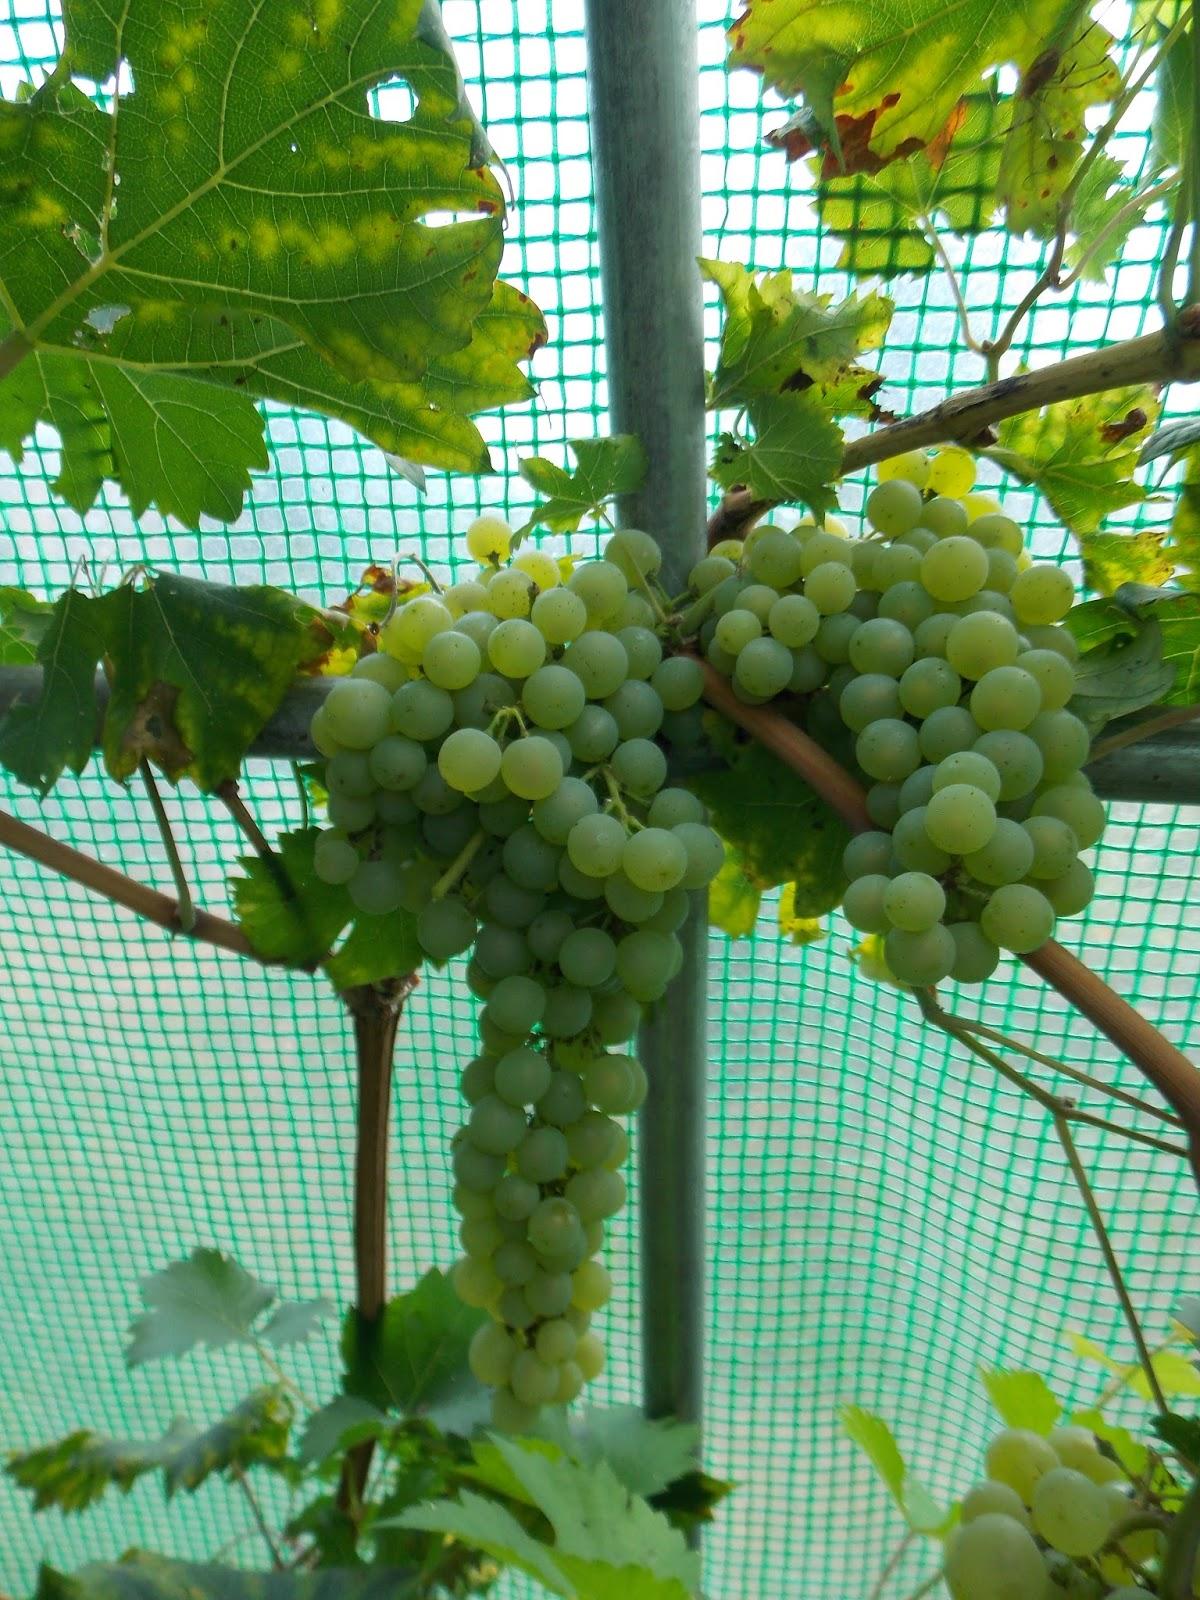 Ecolo bio nature permaculture urbaine et jardinage bio la vigne au jardin - Quand tailler une vigne ...